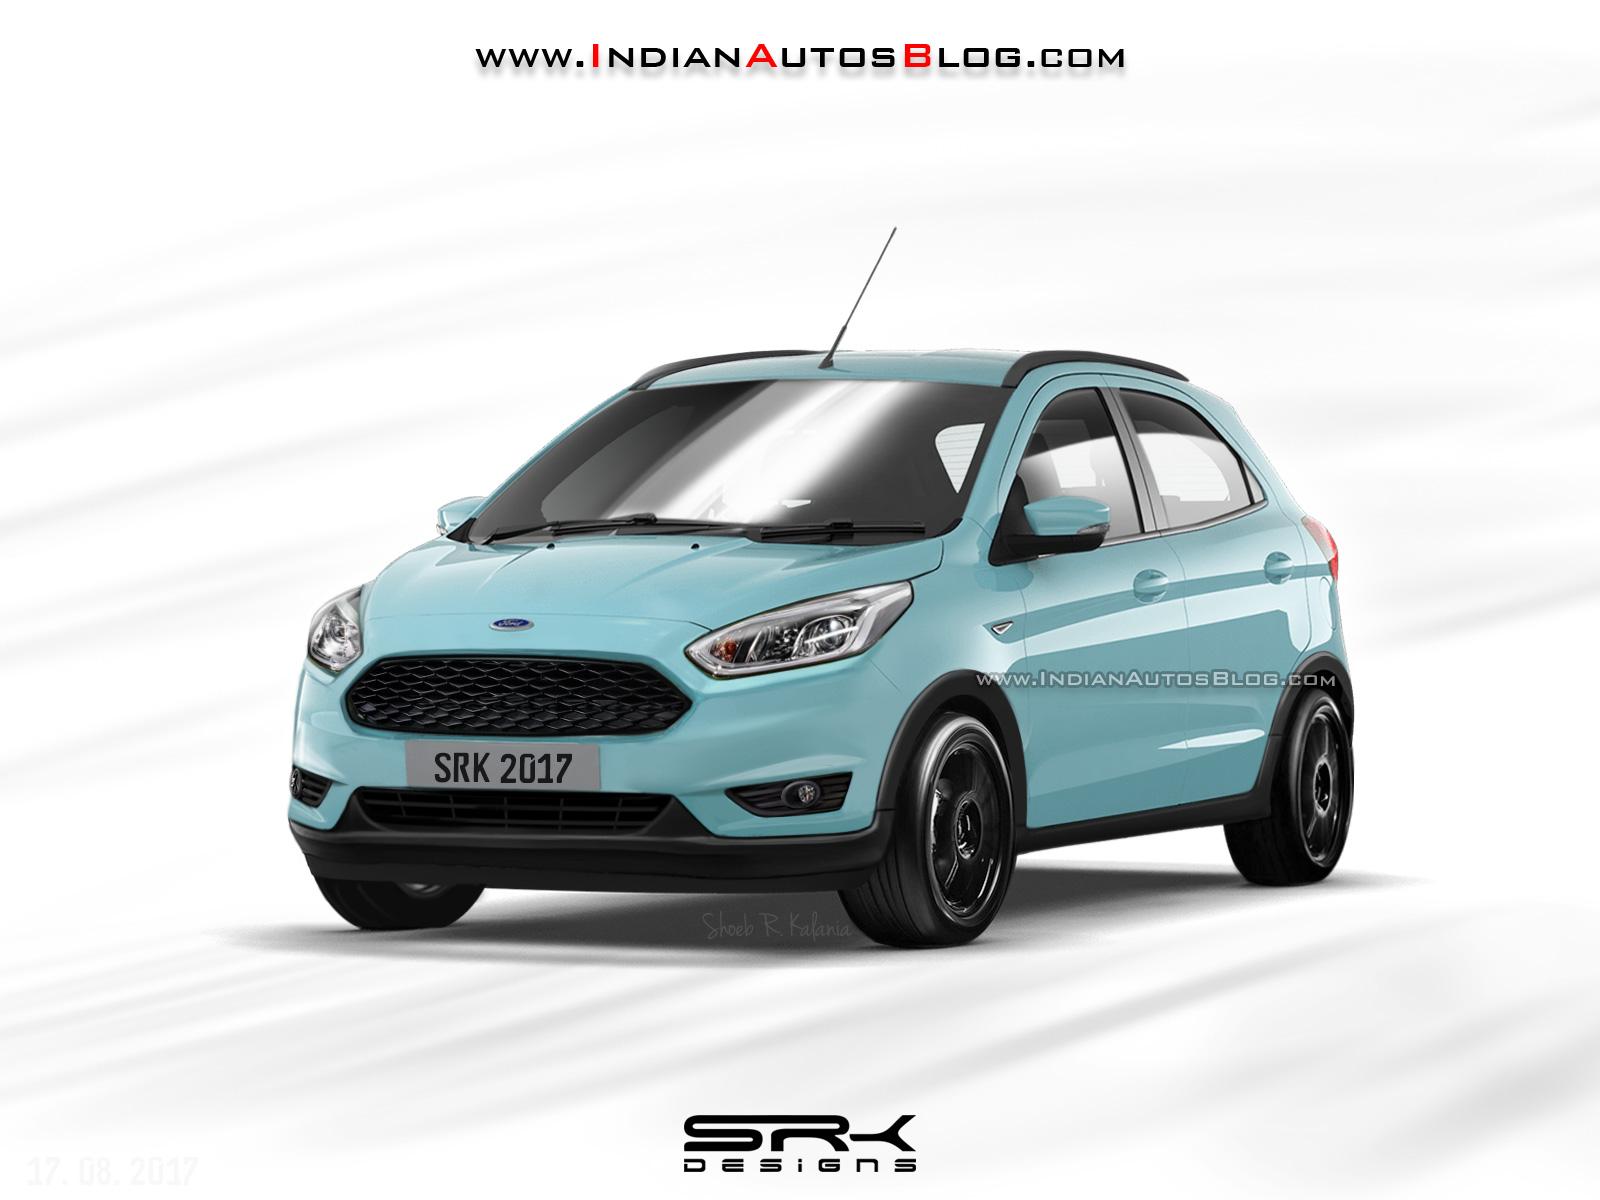 Ford Figo Cross (Ford Figo Active) rendering by IAB